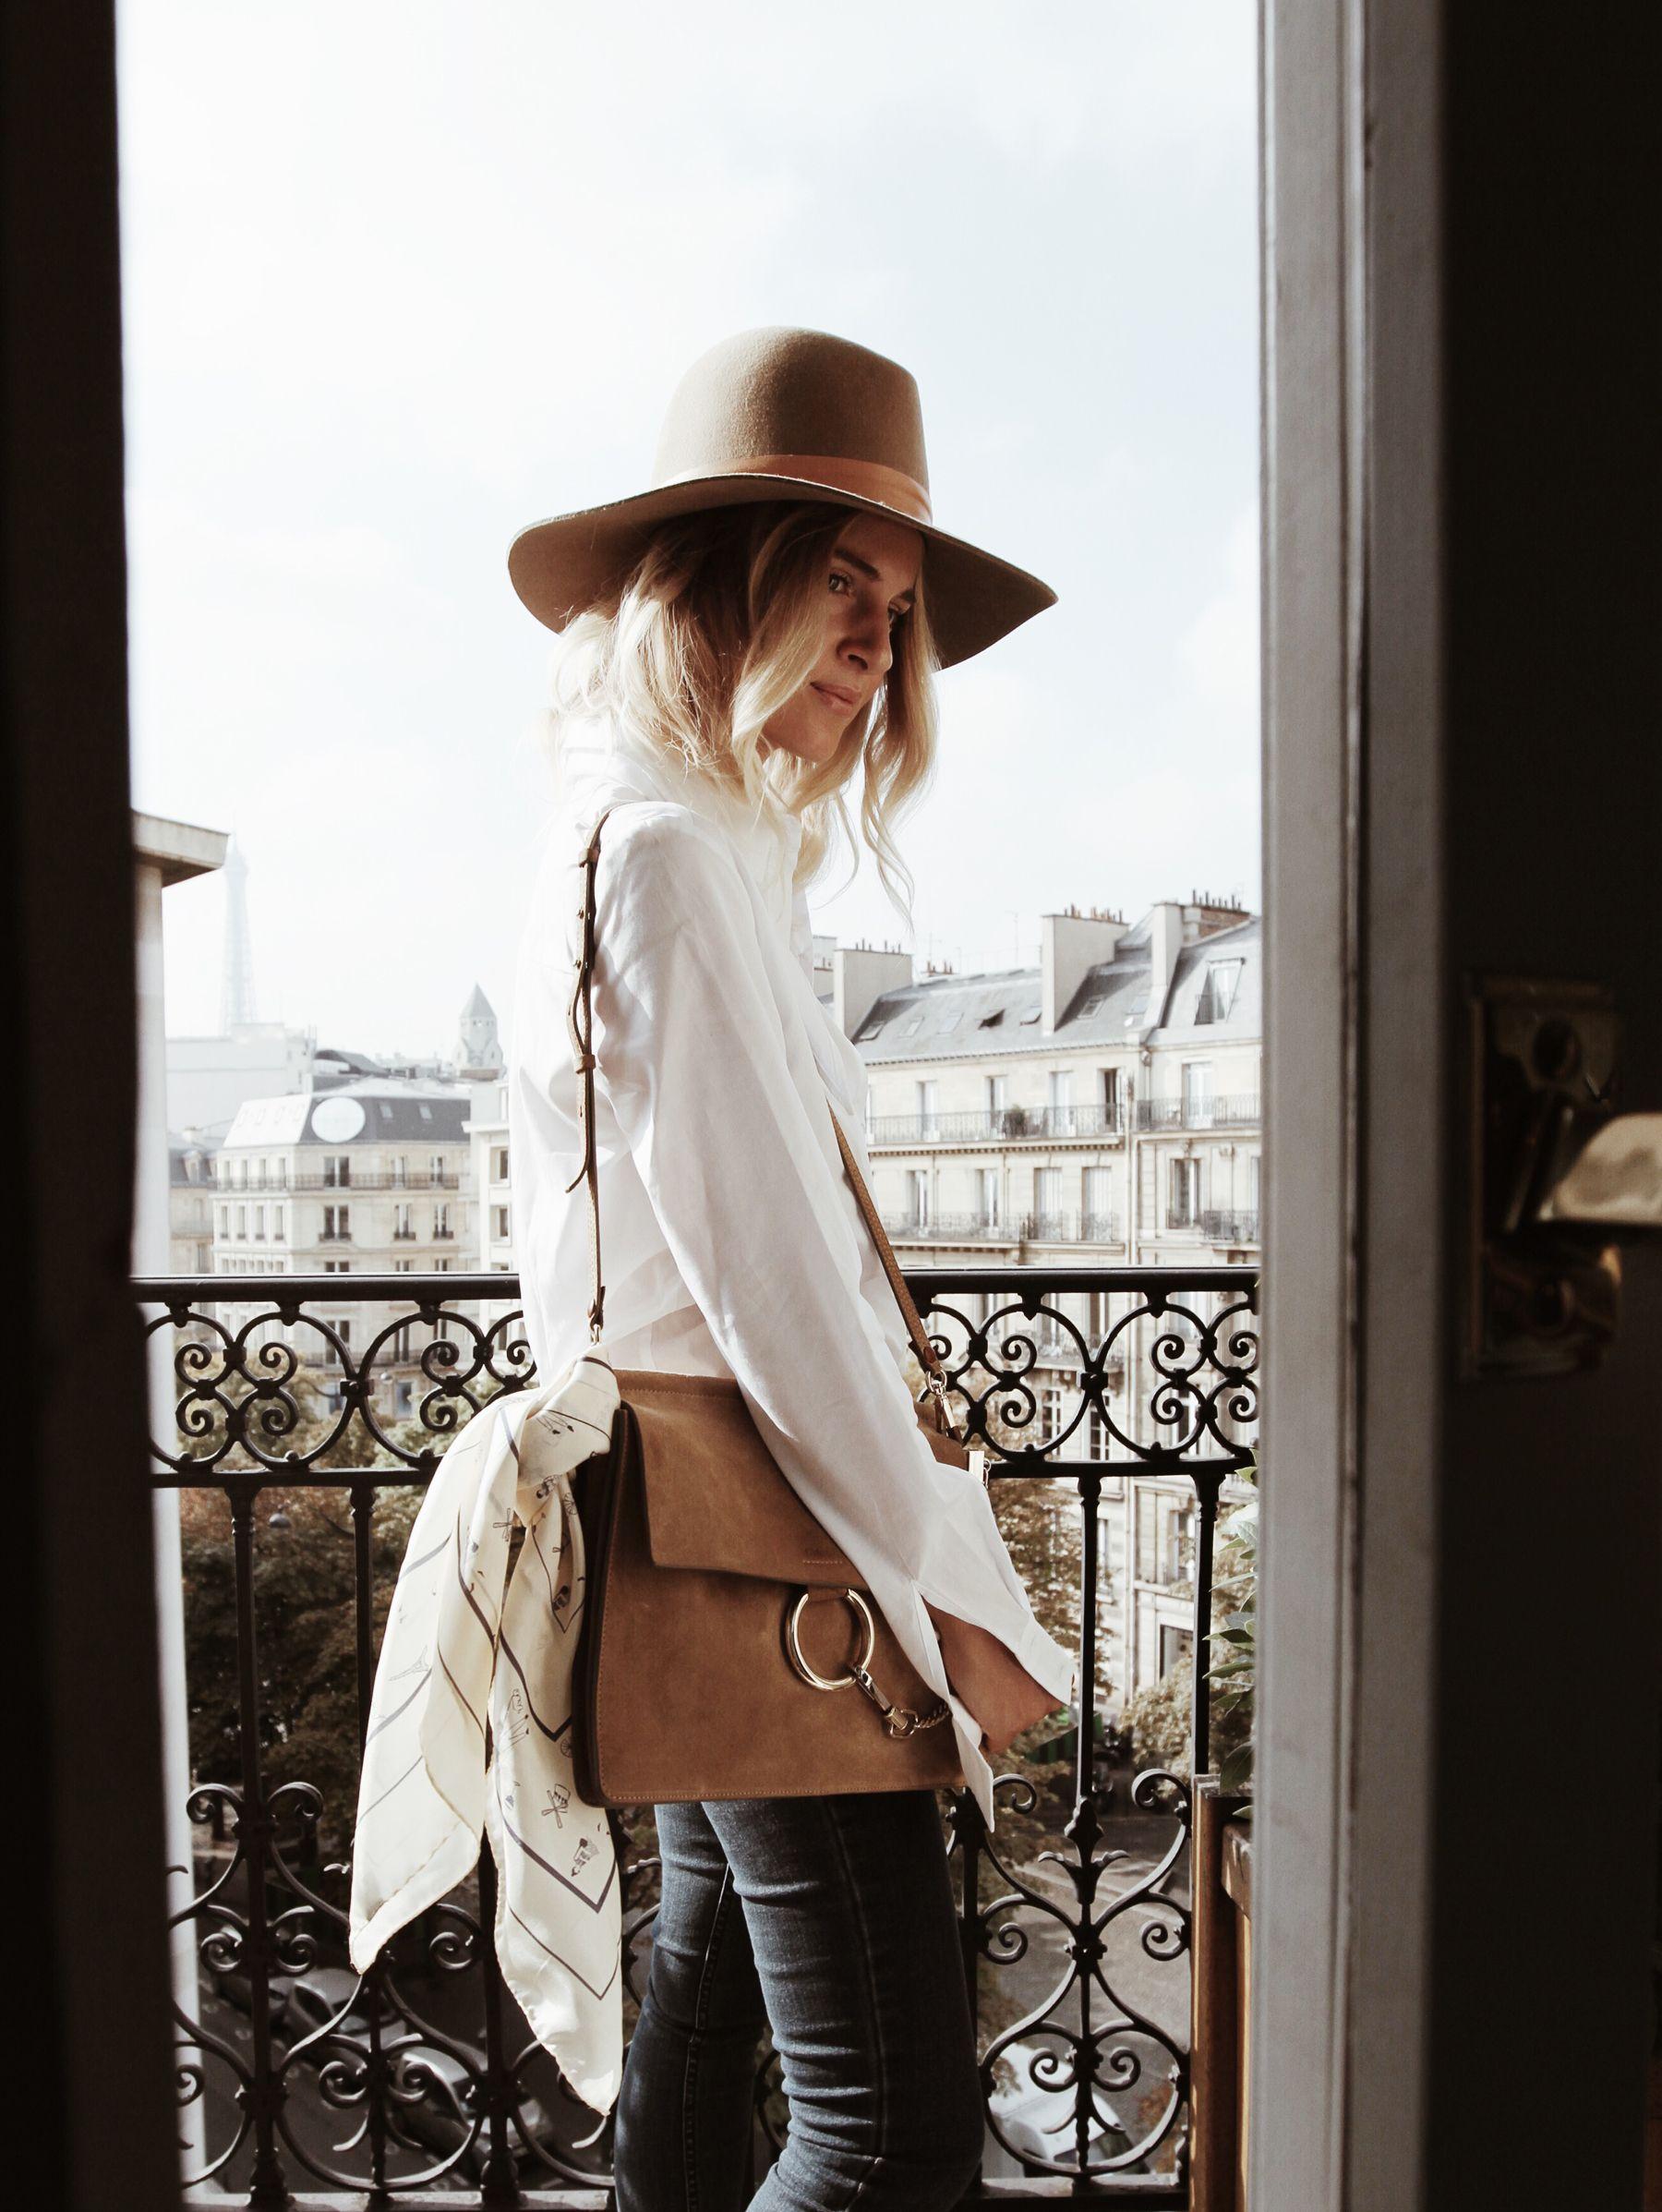 BALZAC PARIS white shirt BALZAC PARIS denim pants ZADIG & VOLTAIRE suede boots (similar here) CHLOÉ faye bag BALZAC PARIS foulard Photos by F. Flatau _____ _____ I had the chance to stay in